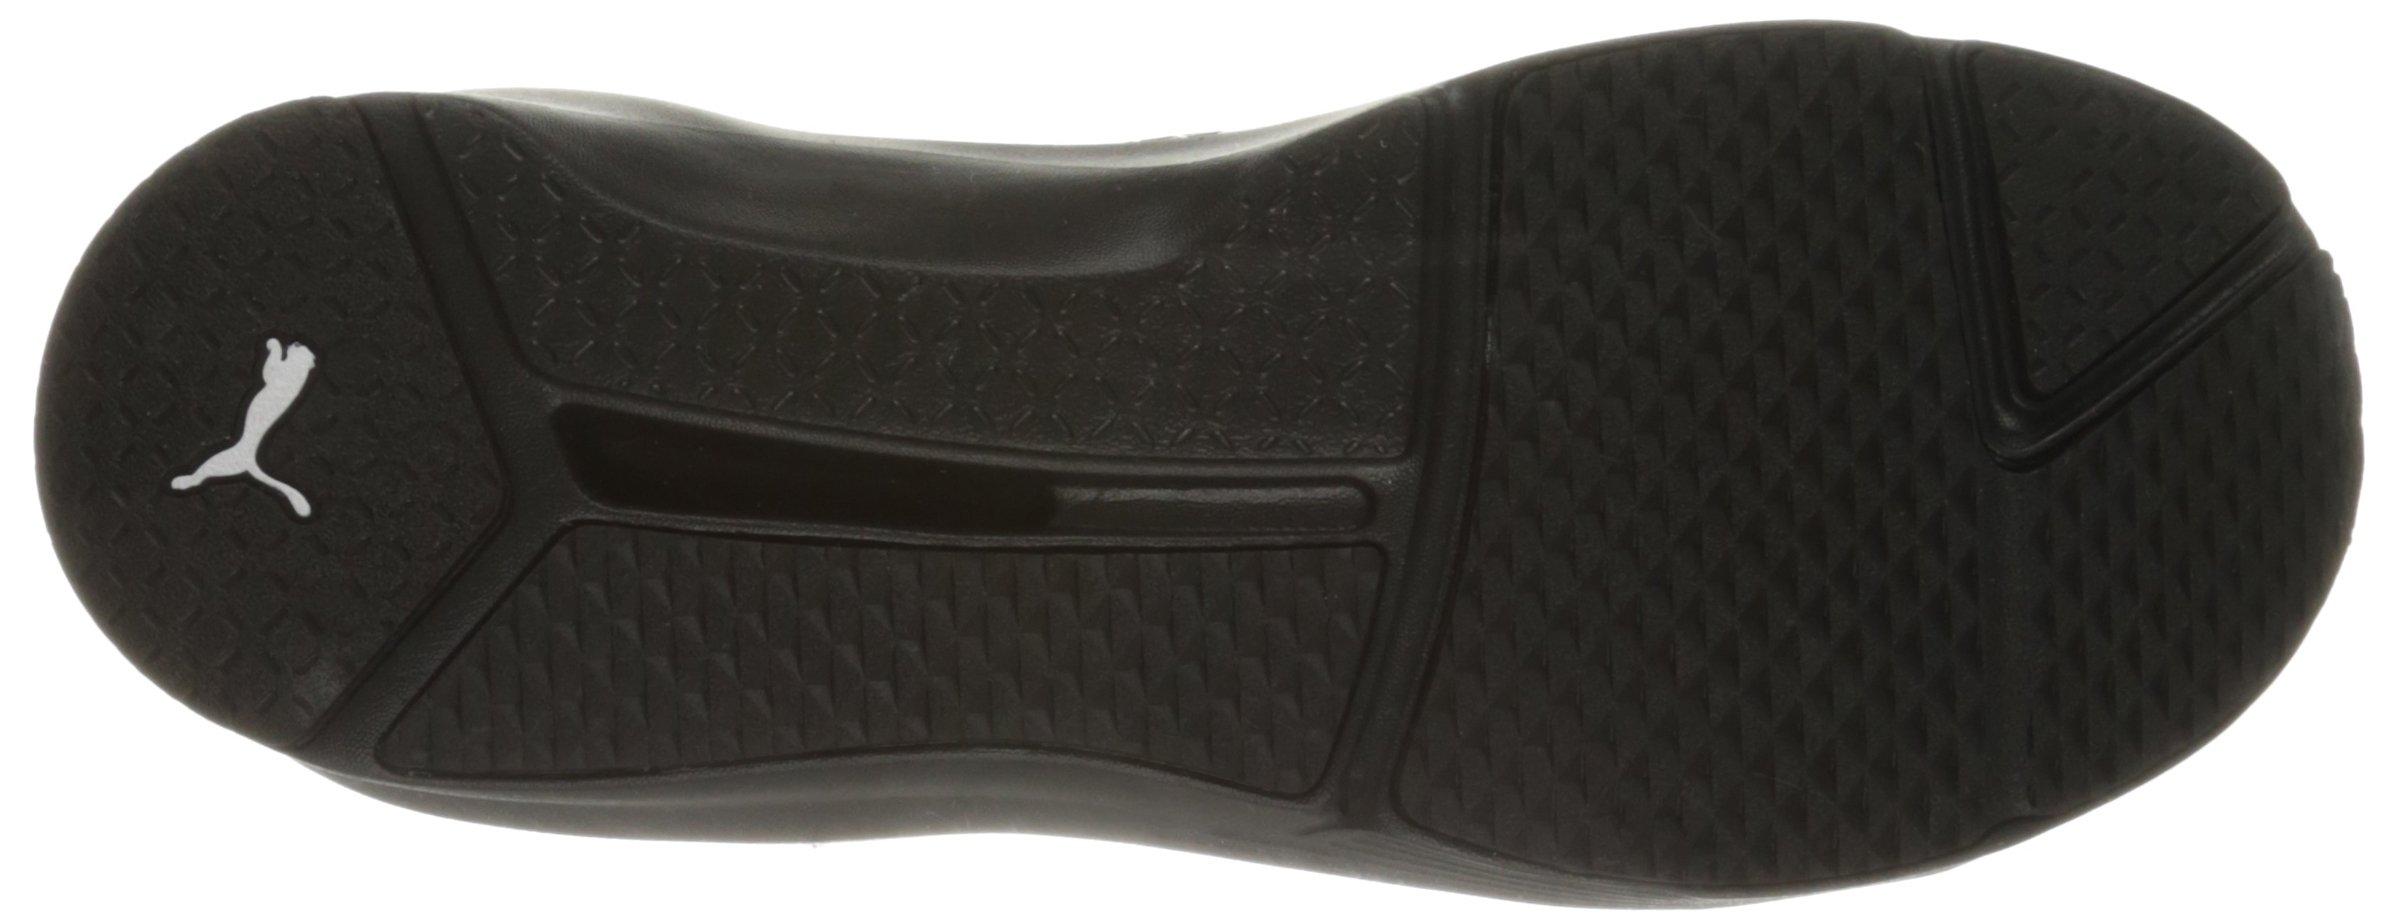 PUMA Women's Fierce Core Cross-Trainer Shoe, Black Black, 9 M US by PUMA (Image #3)